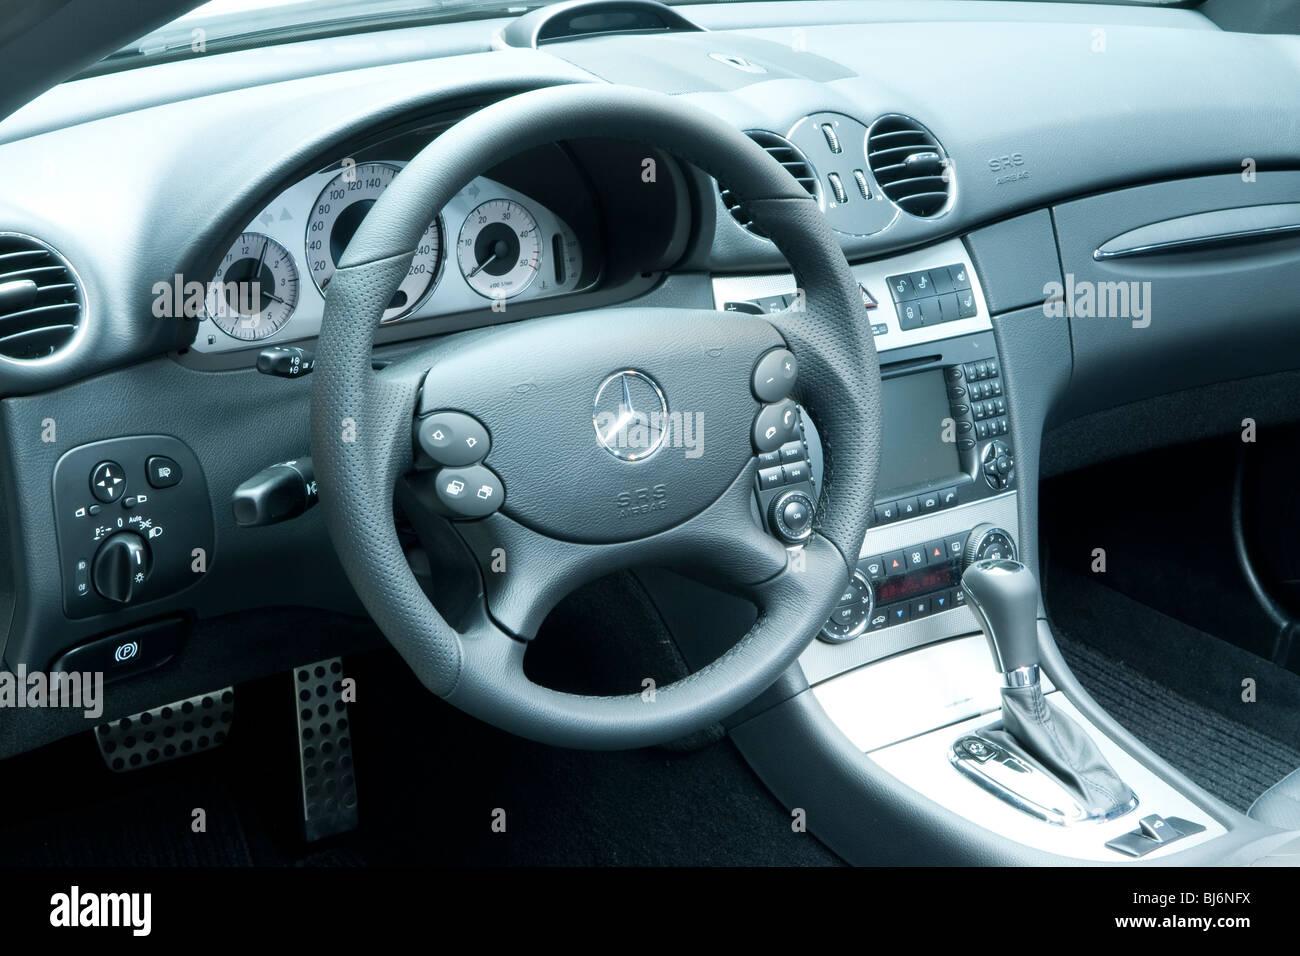 Armaturenbrett mercedes  Mercedes Auto Innenraum mit Lenkrad Armaturenbrett und Gear Shift ...